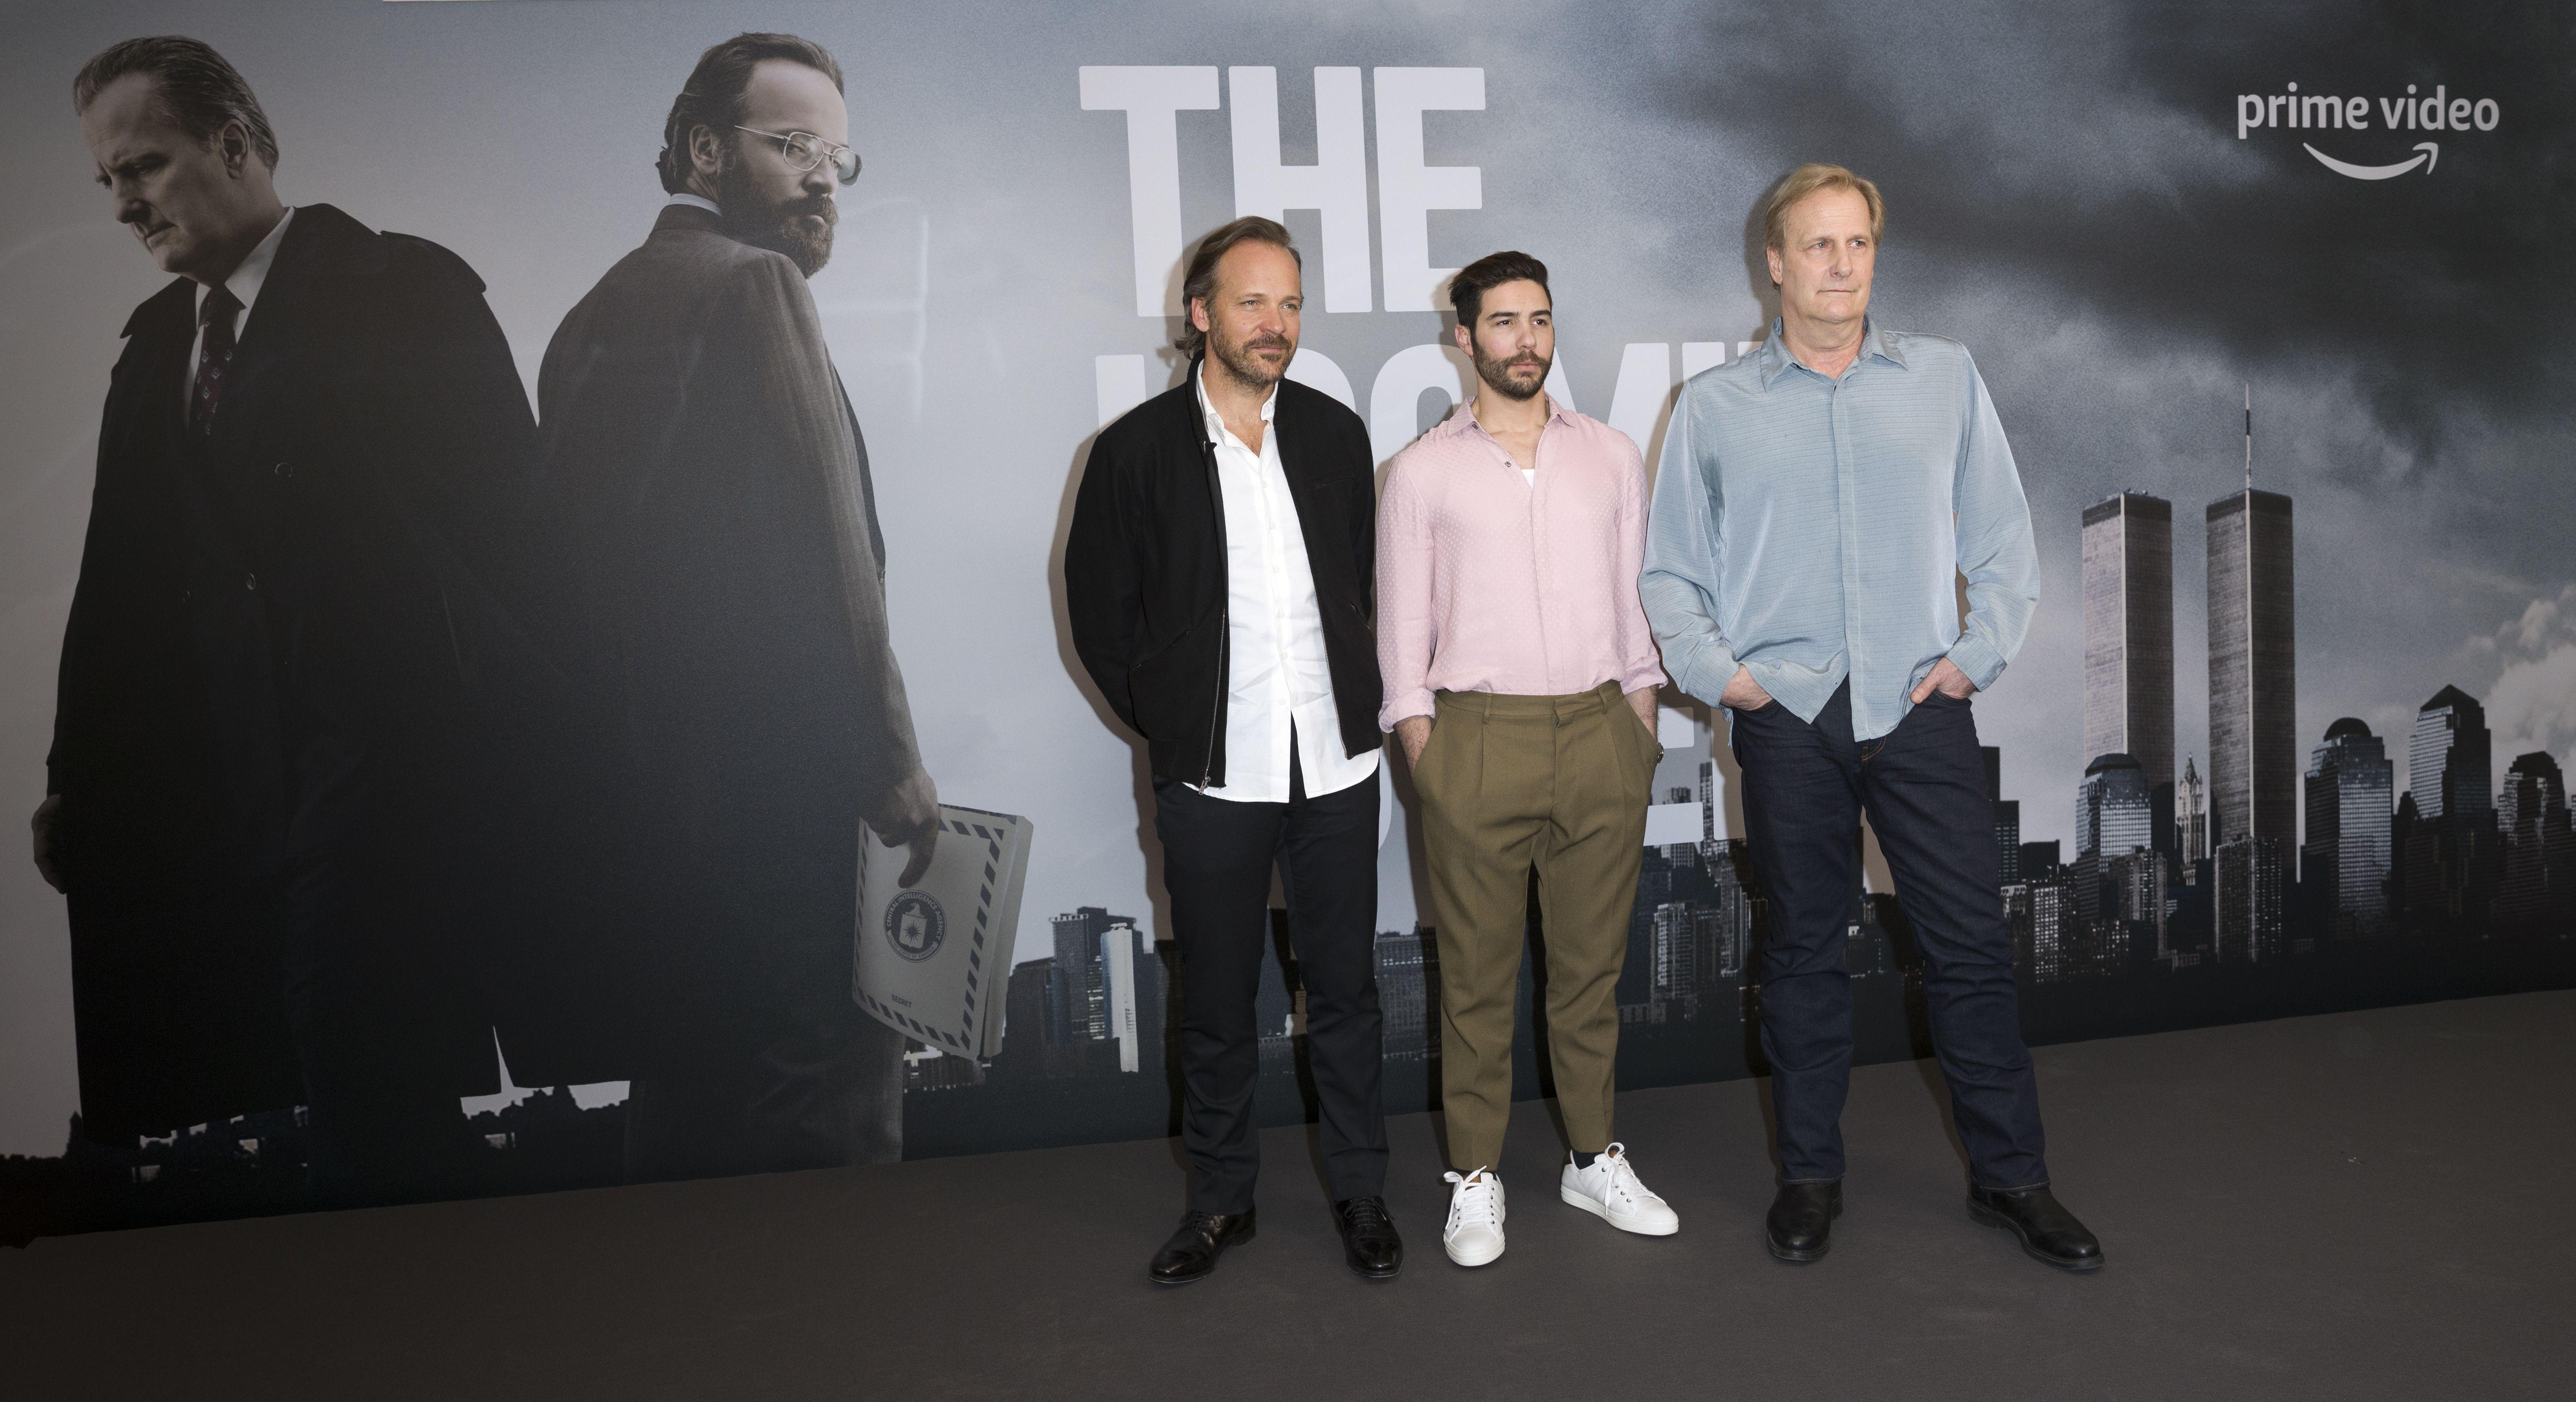 Peter Sarsgaard, Jeff Daniels, Tahir Rahim ....Photocall of the movie The Looming Tower at the 68th International Film Festival Berlinale, Berlin, Germany - 20 Feb 2018